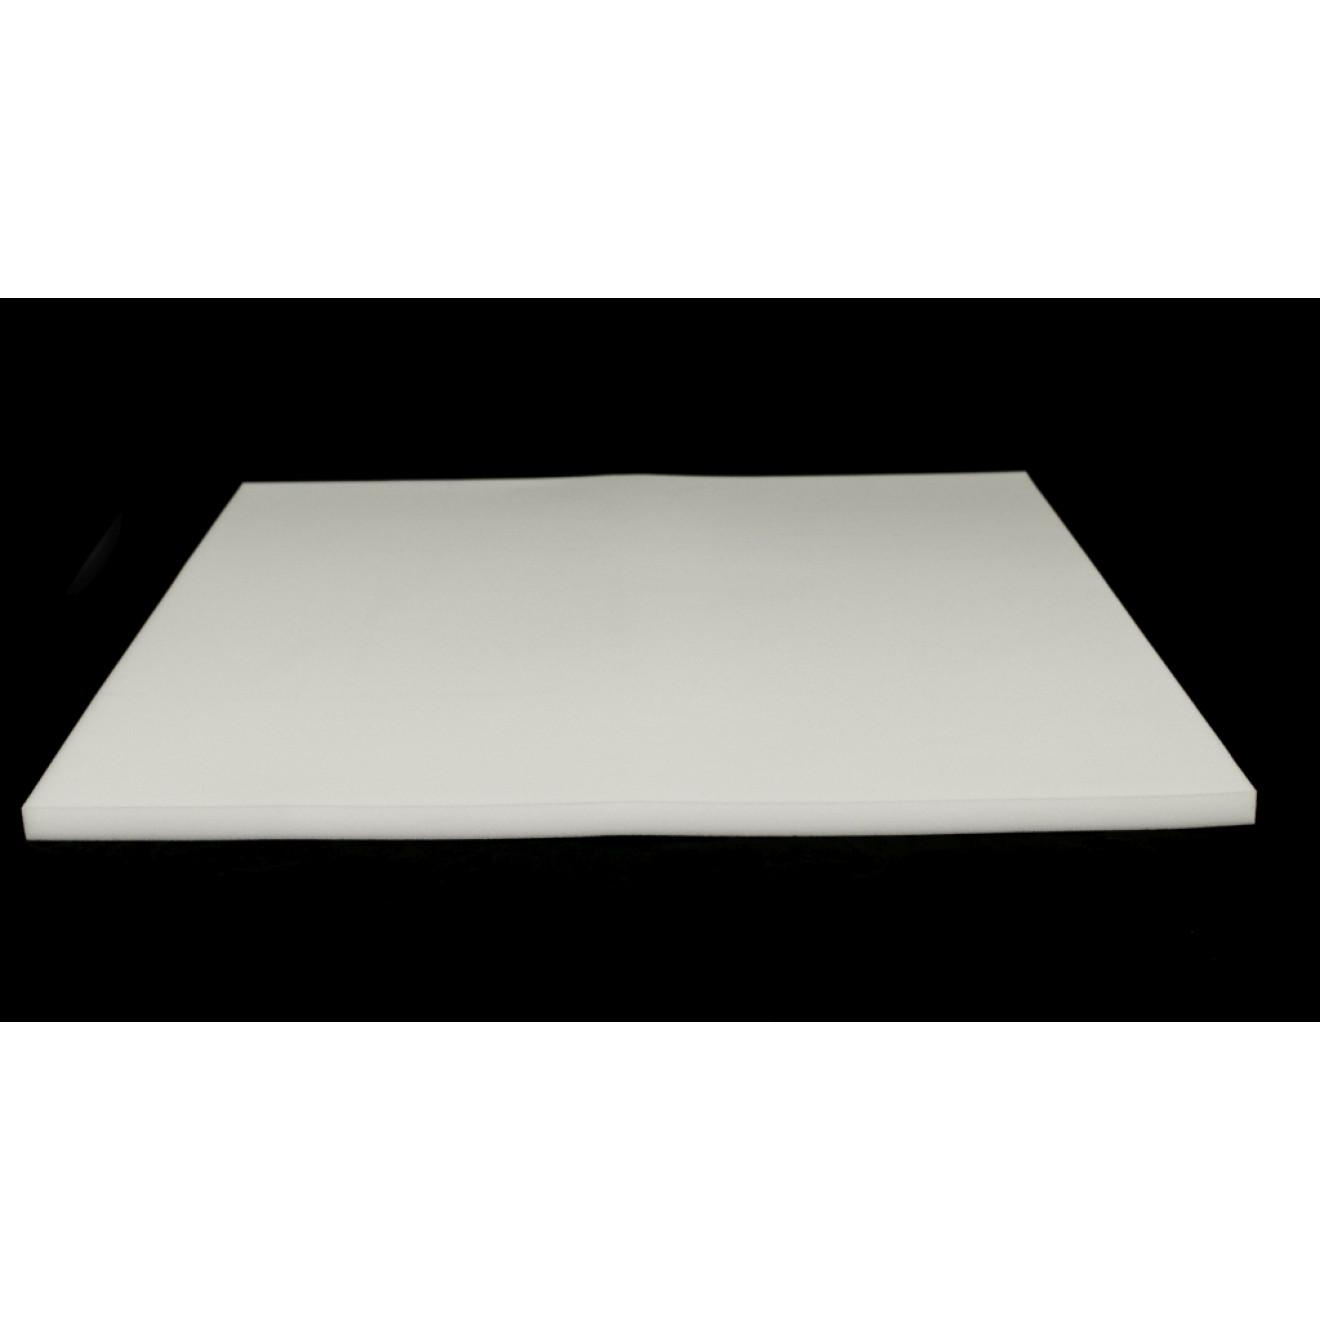 Schaumstoff f r verpackung kaufen - Plaque bitume isolation phonique ...